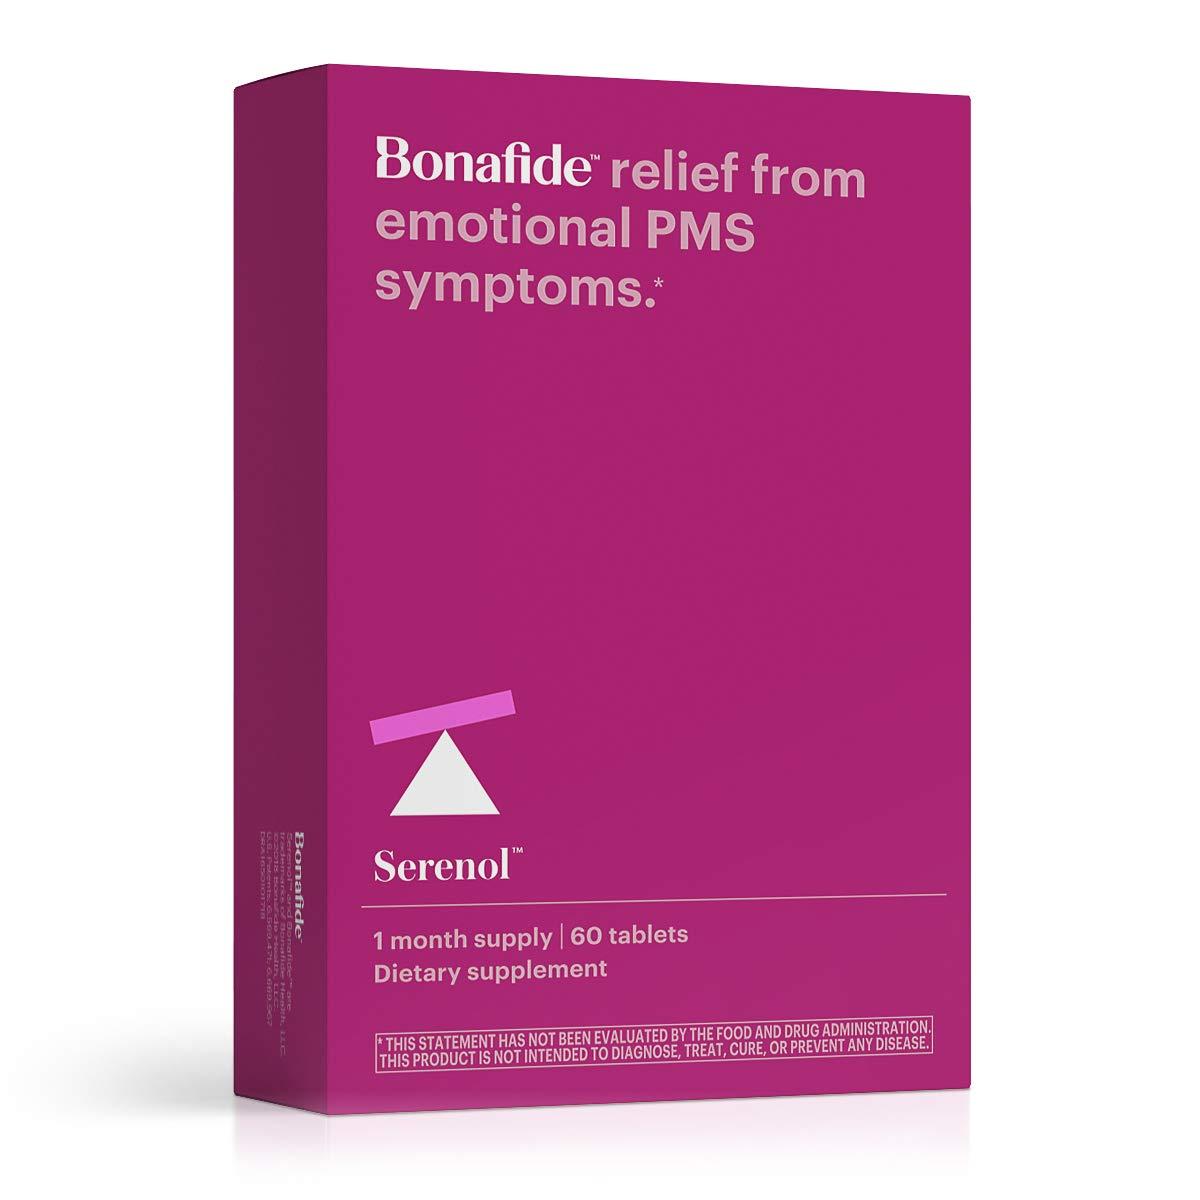 Bonafide - Serenol Multi-Symptom PMS Relief - Drug-Free PMS Treatment - 60 Tablets (1 Month) by Serenol